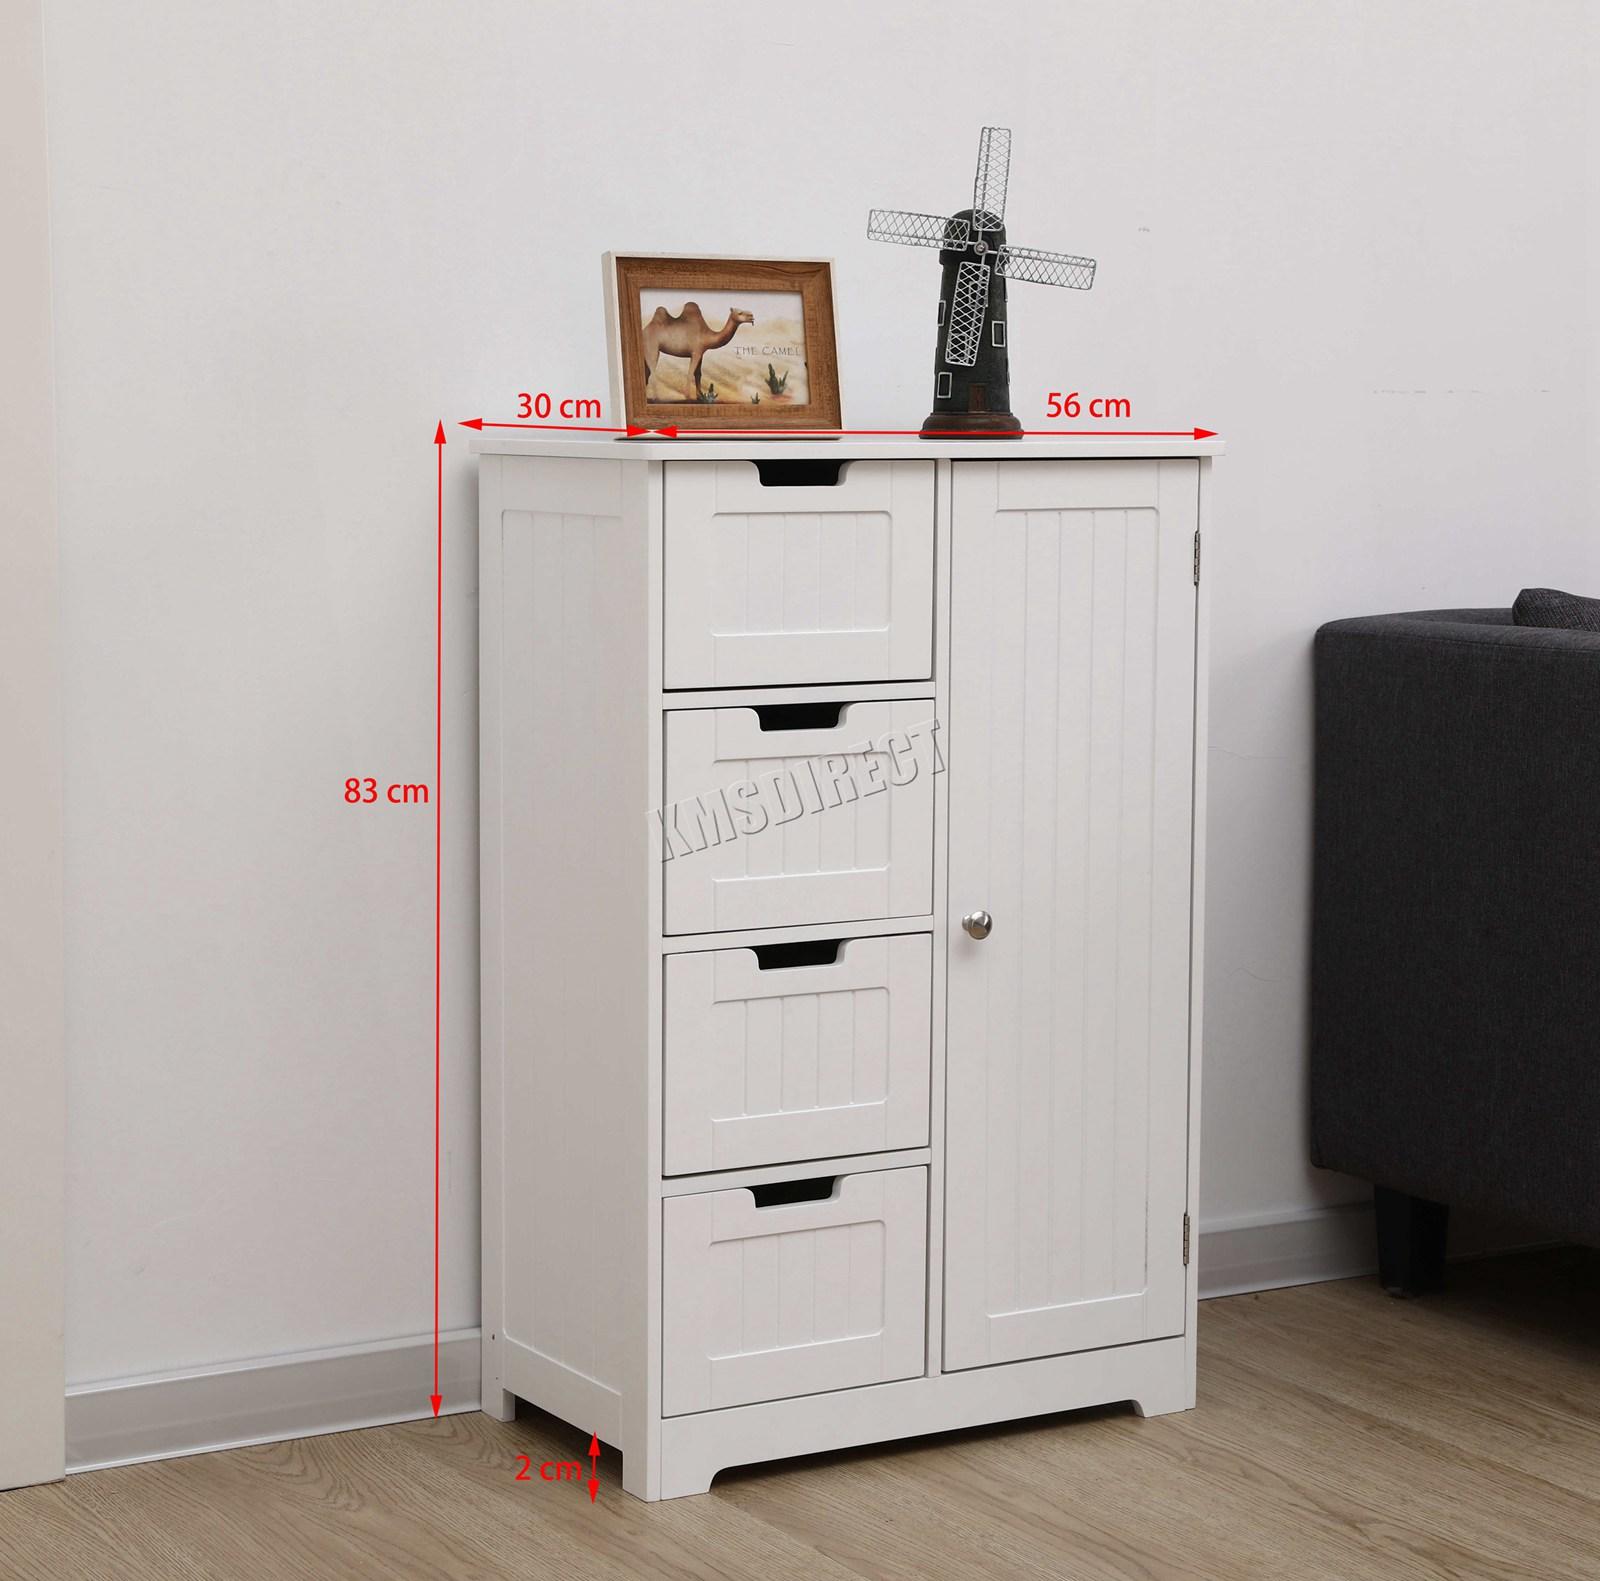 Details About Westwood Bathroom Storage Cabinet Wooden 4 Drawer Cupboard Free Standing Unit